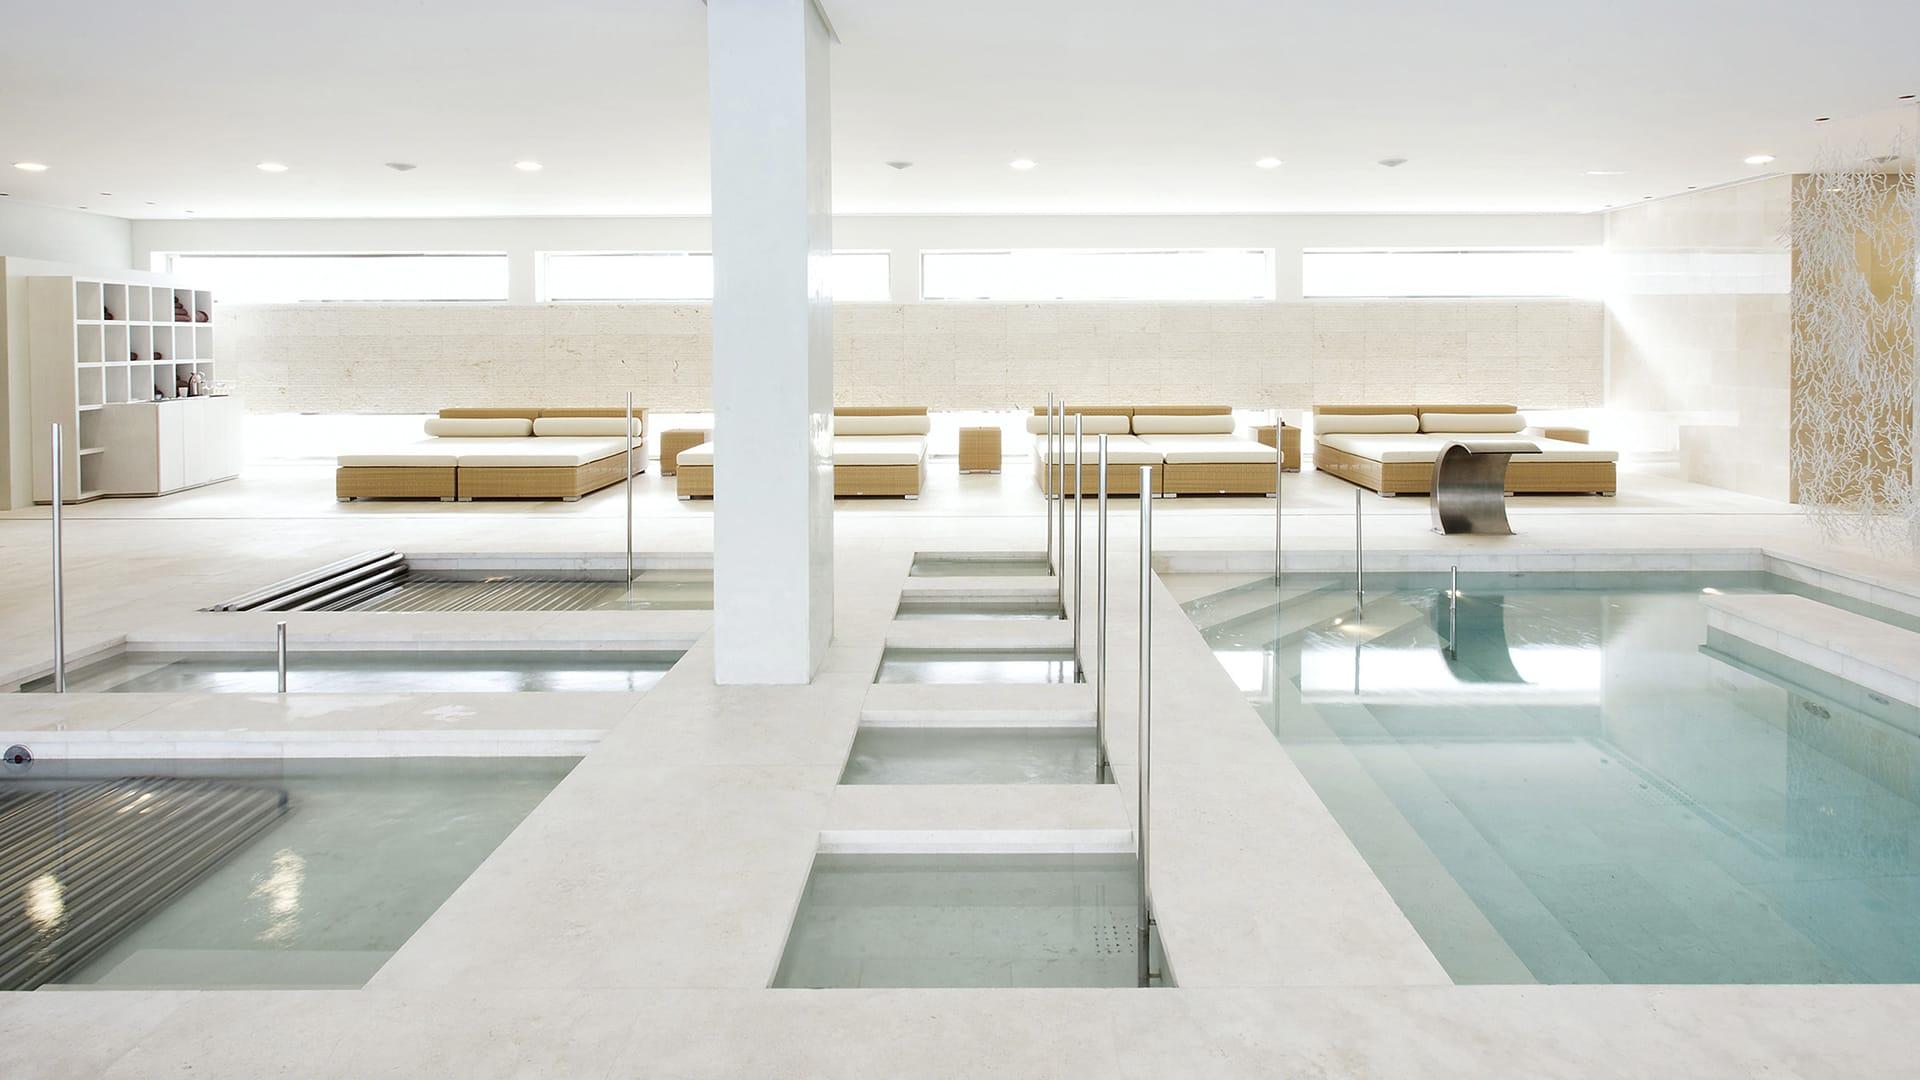 tino-natural-stone-casino-ibiza-interiors-bathrooms-iceberg-fantasy-granito-negro